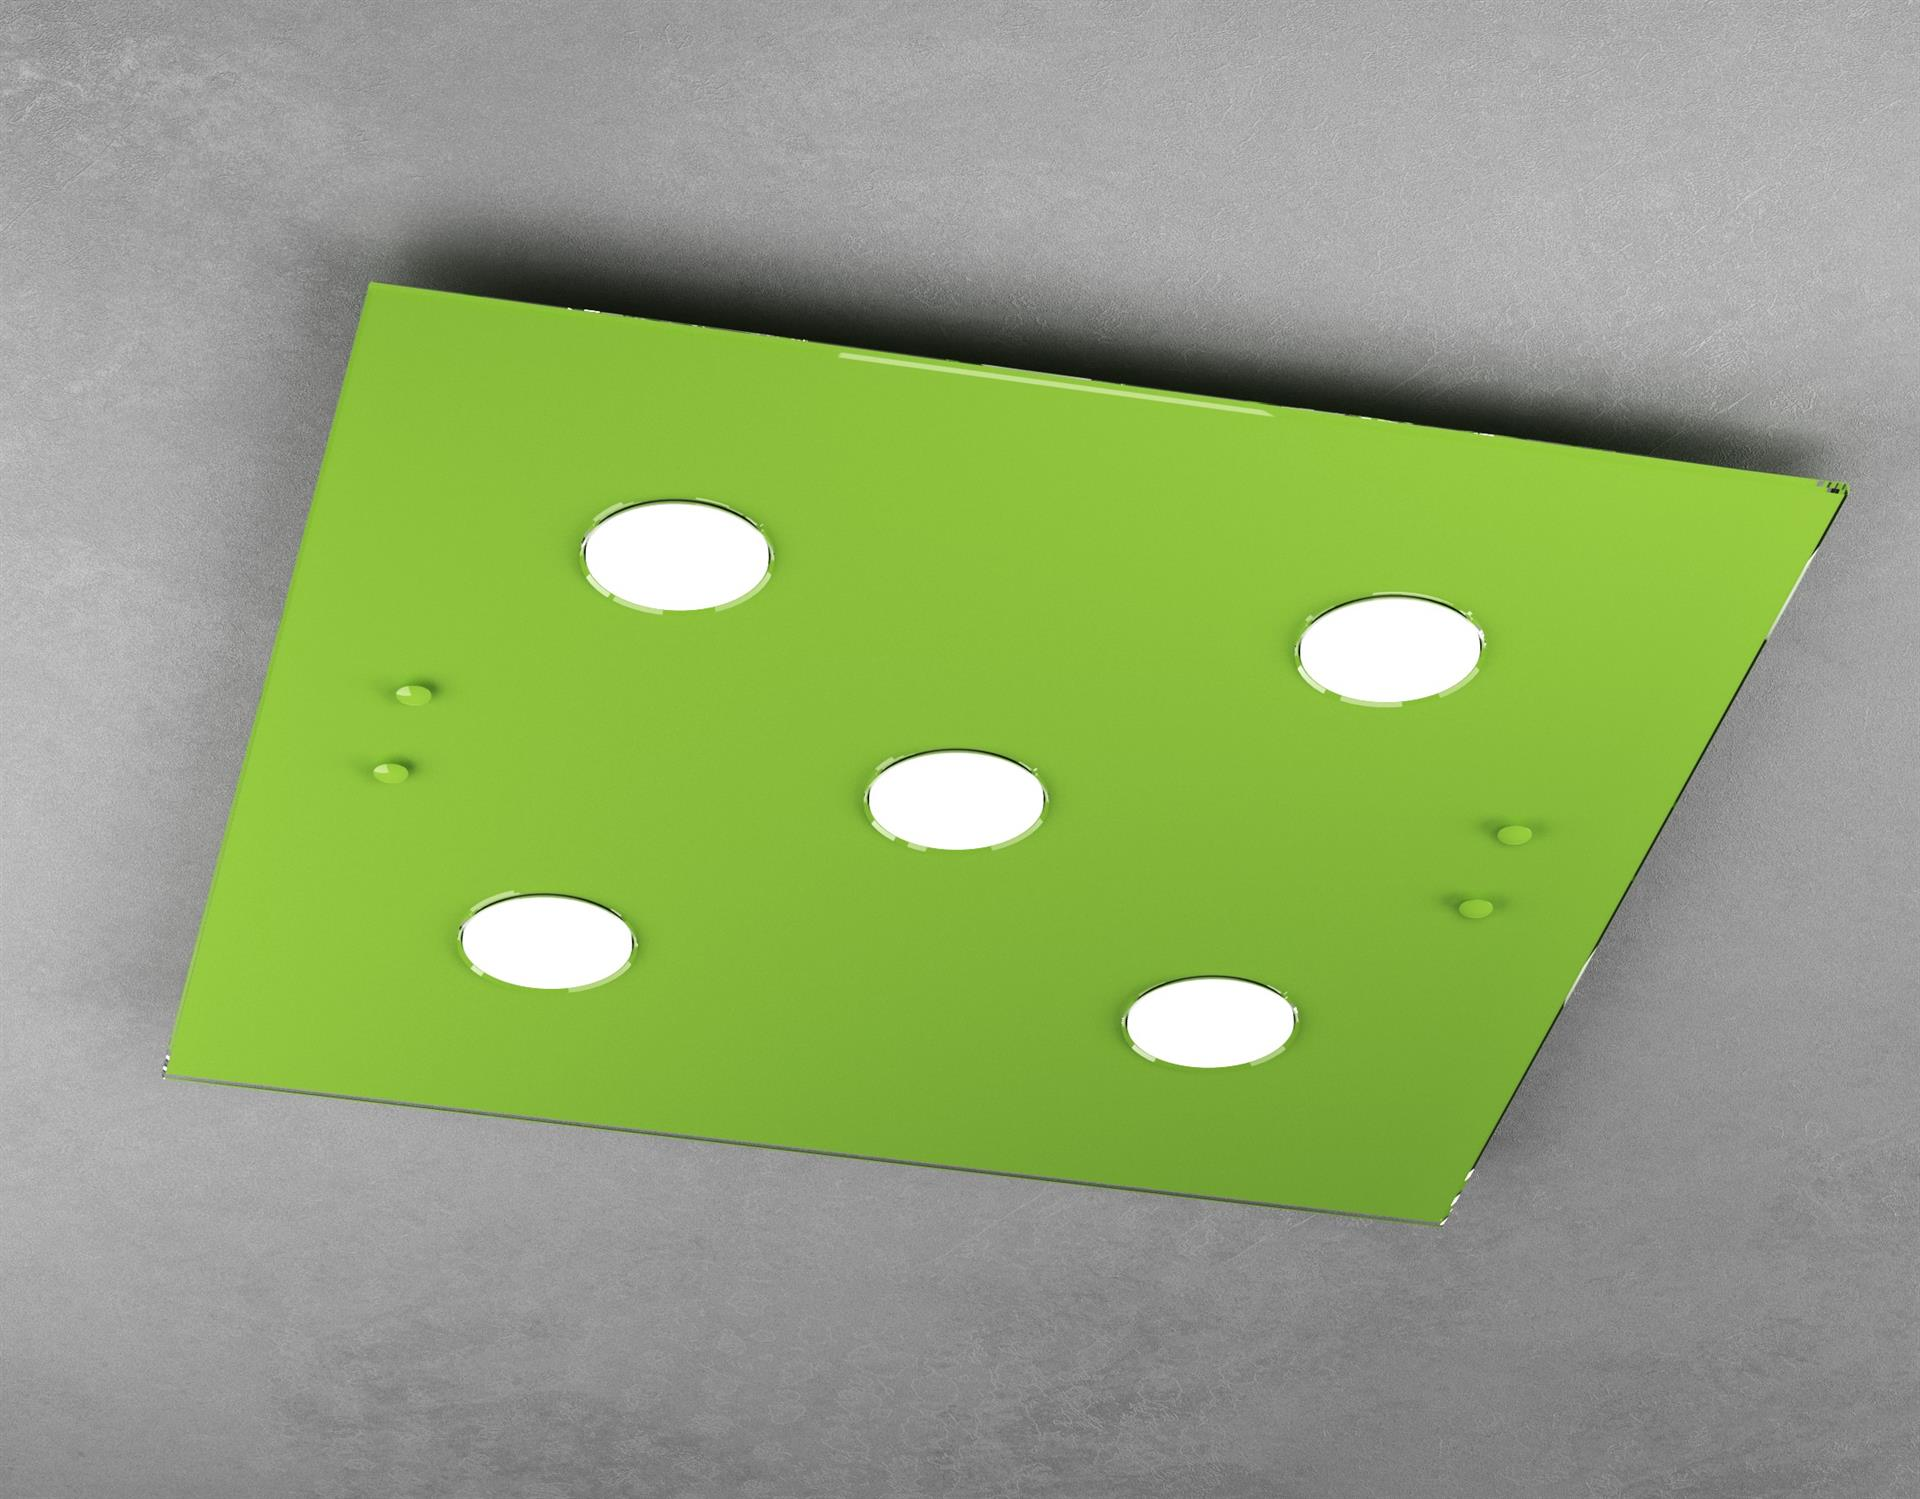 Plafoniera Led Cameretta.Plafoniera Led In Vetro Lucido Verde Da Cameretta Moderna Top Light Path